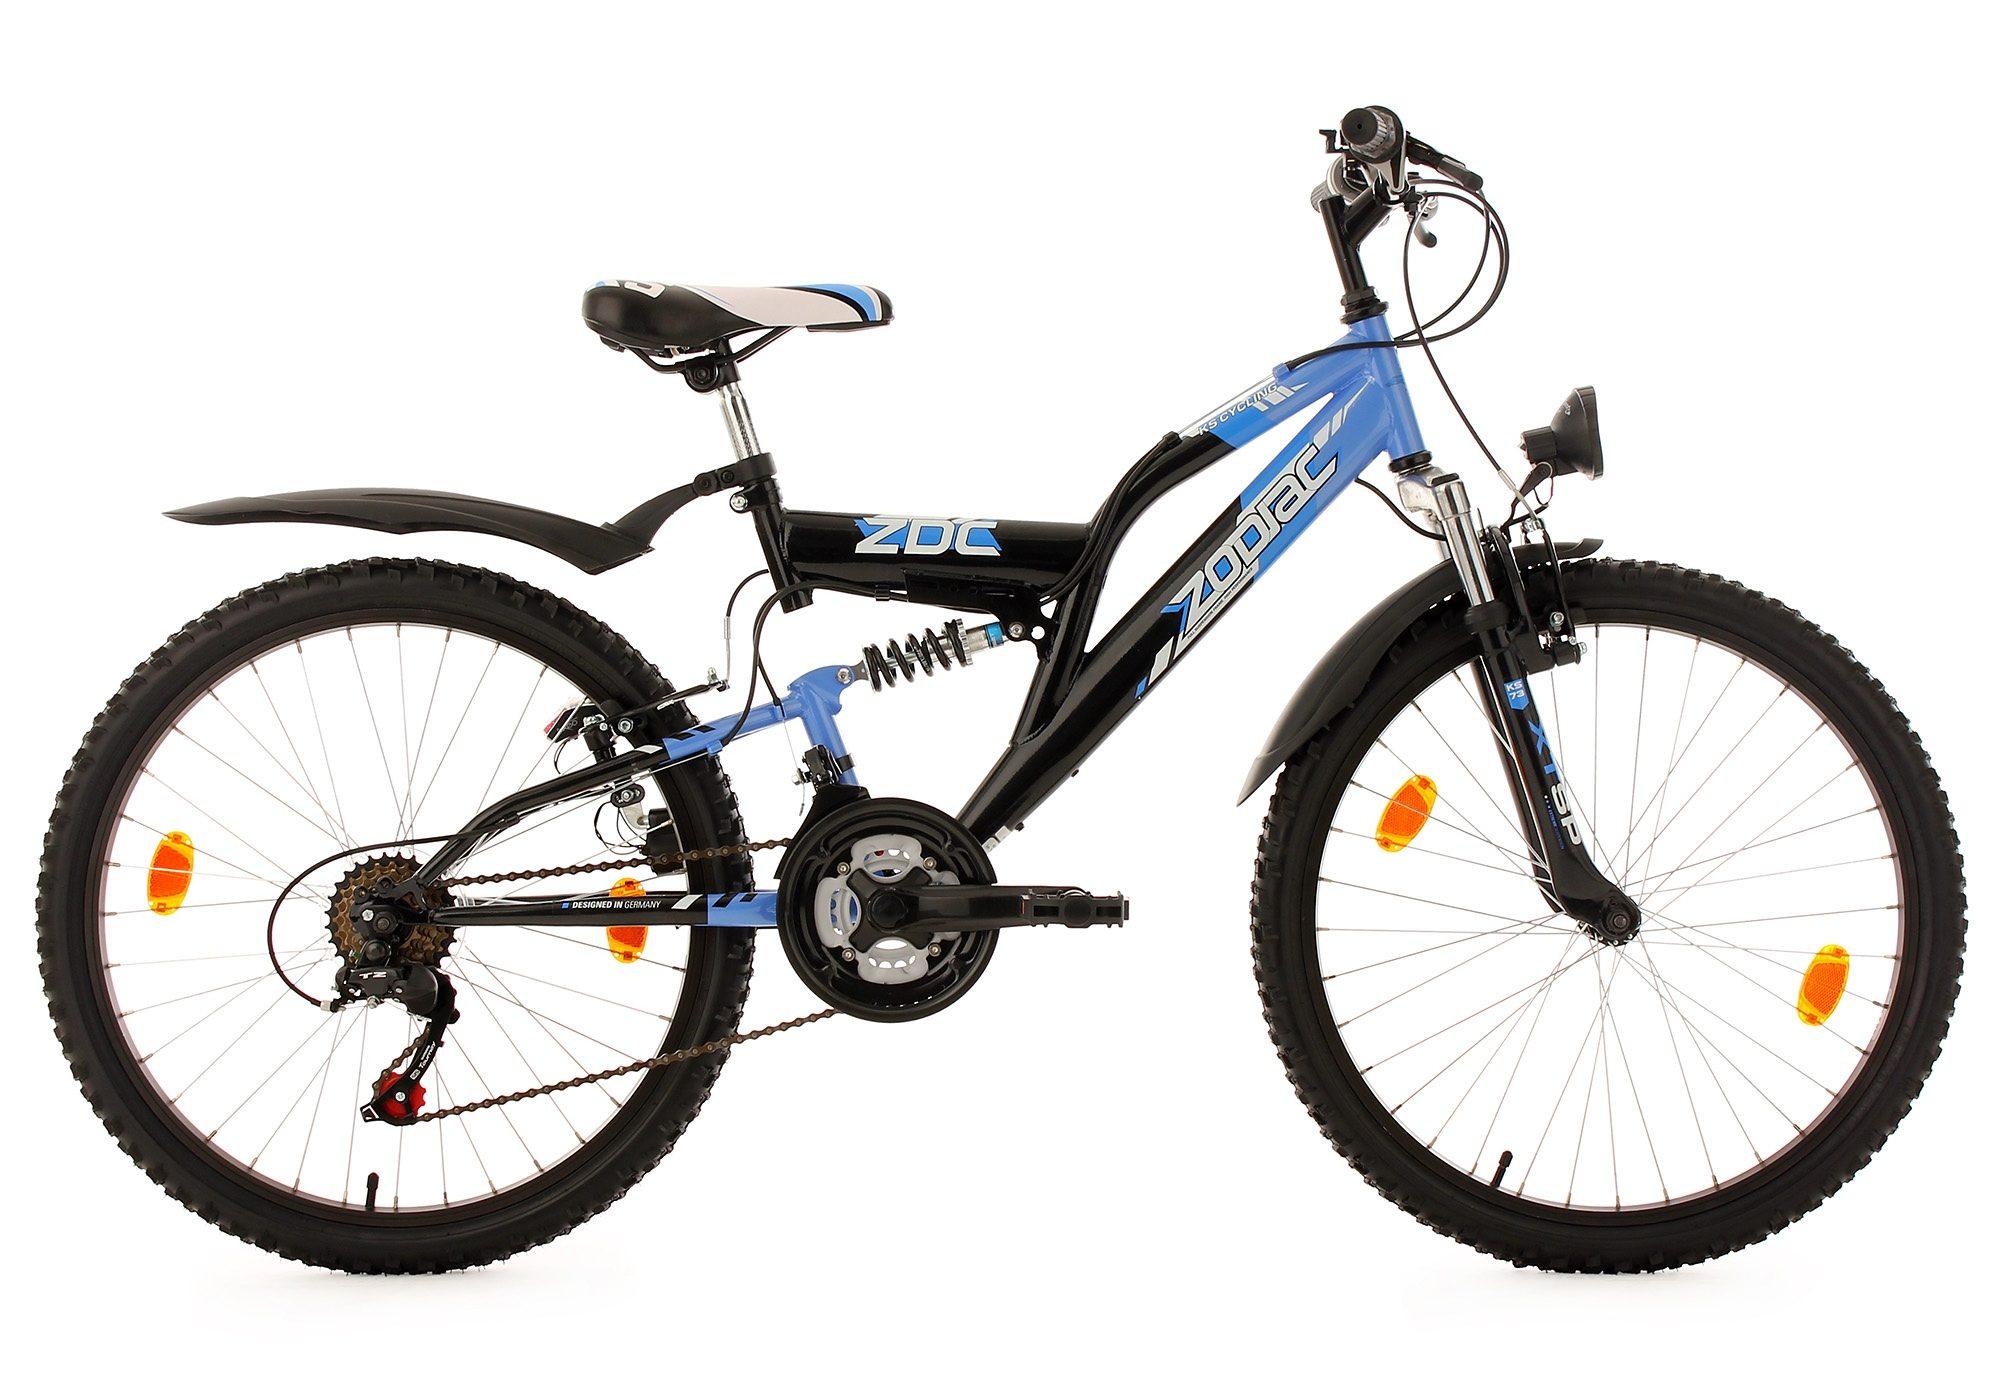 Fully Jugend-Mountainbike, 24 Zoll, blau-schwarz, 18-Gang-Kettenschaltung, »Zodiac«, KS Cycling